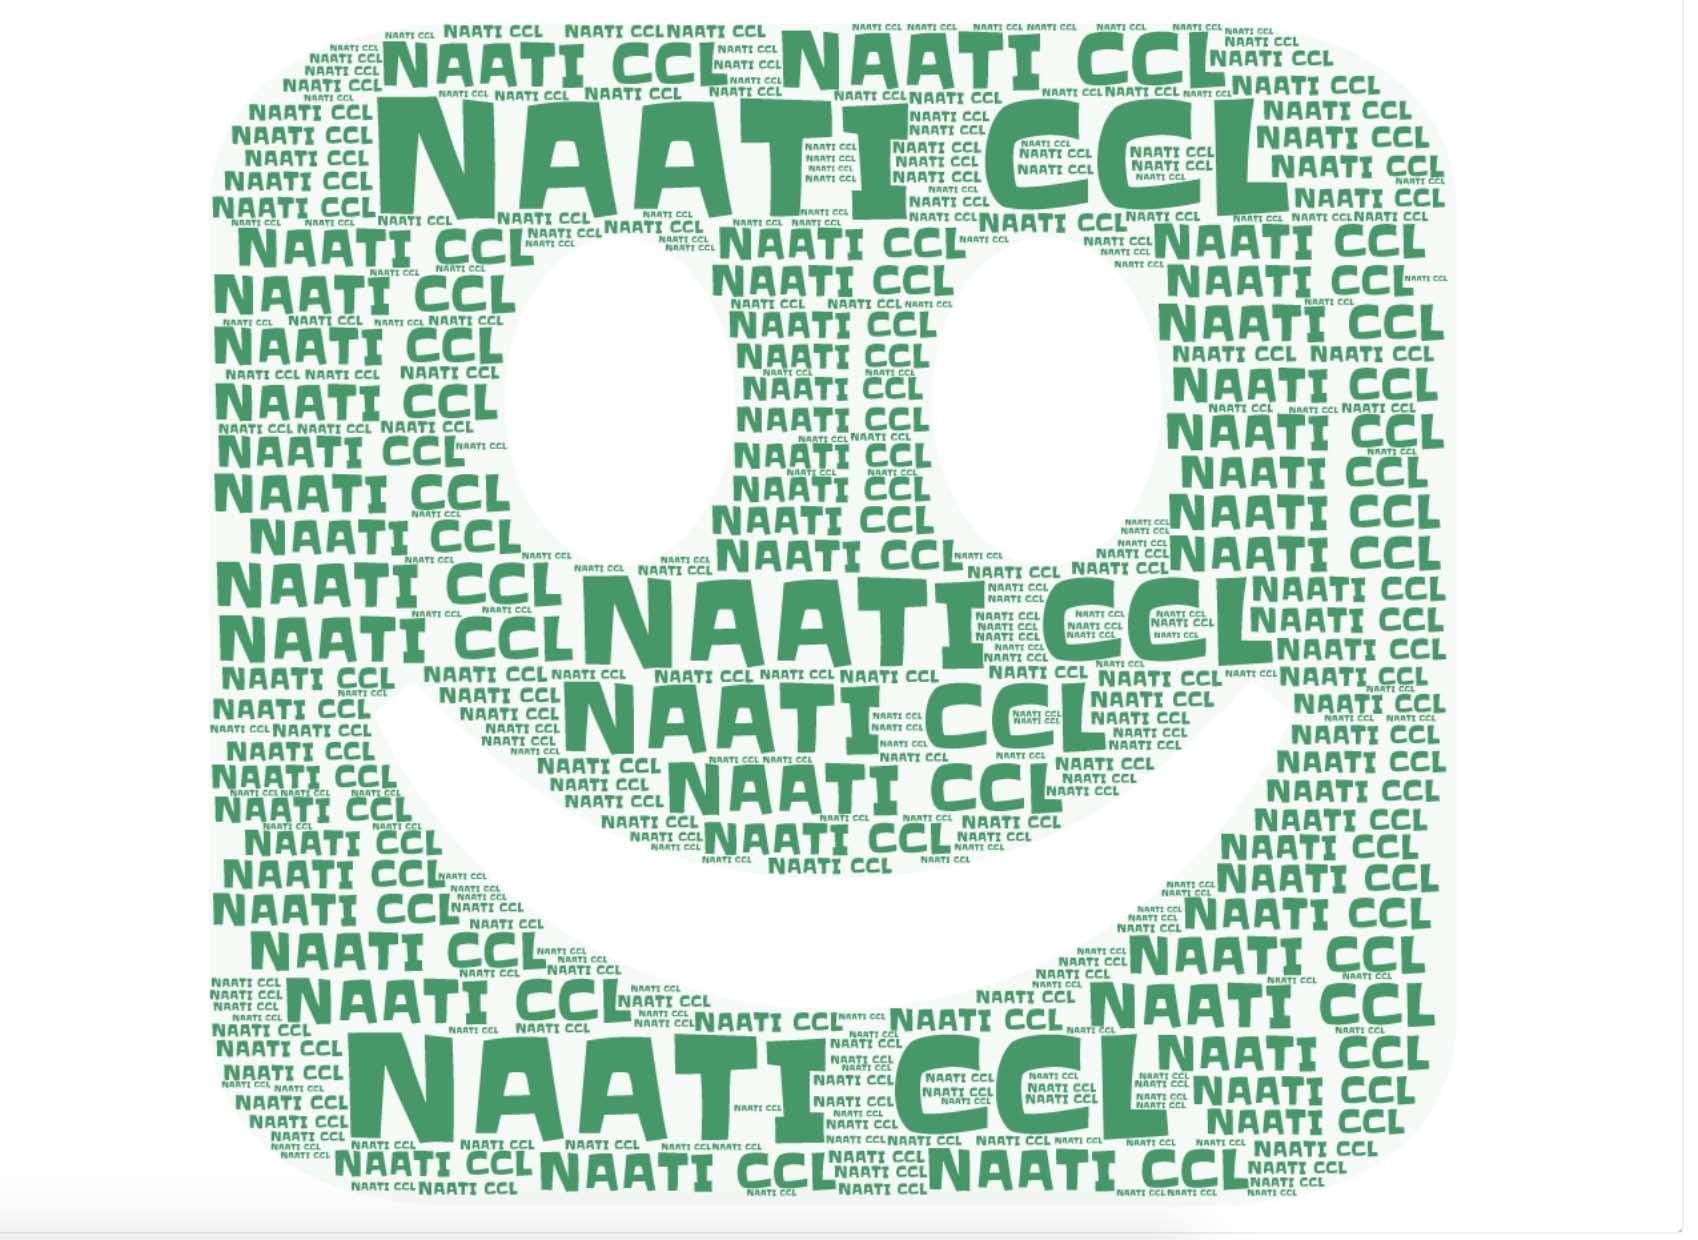 NAATI CCL, five bonus points toward Permanent Residency